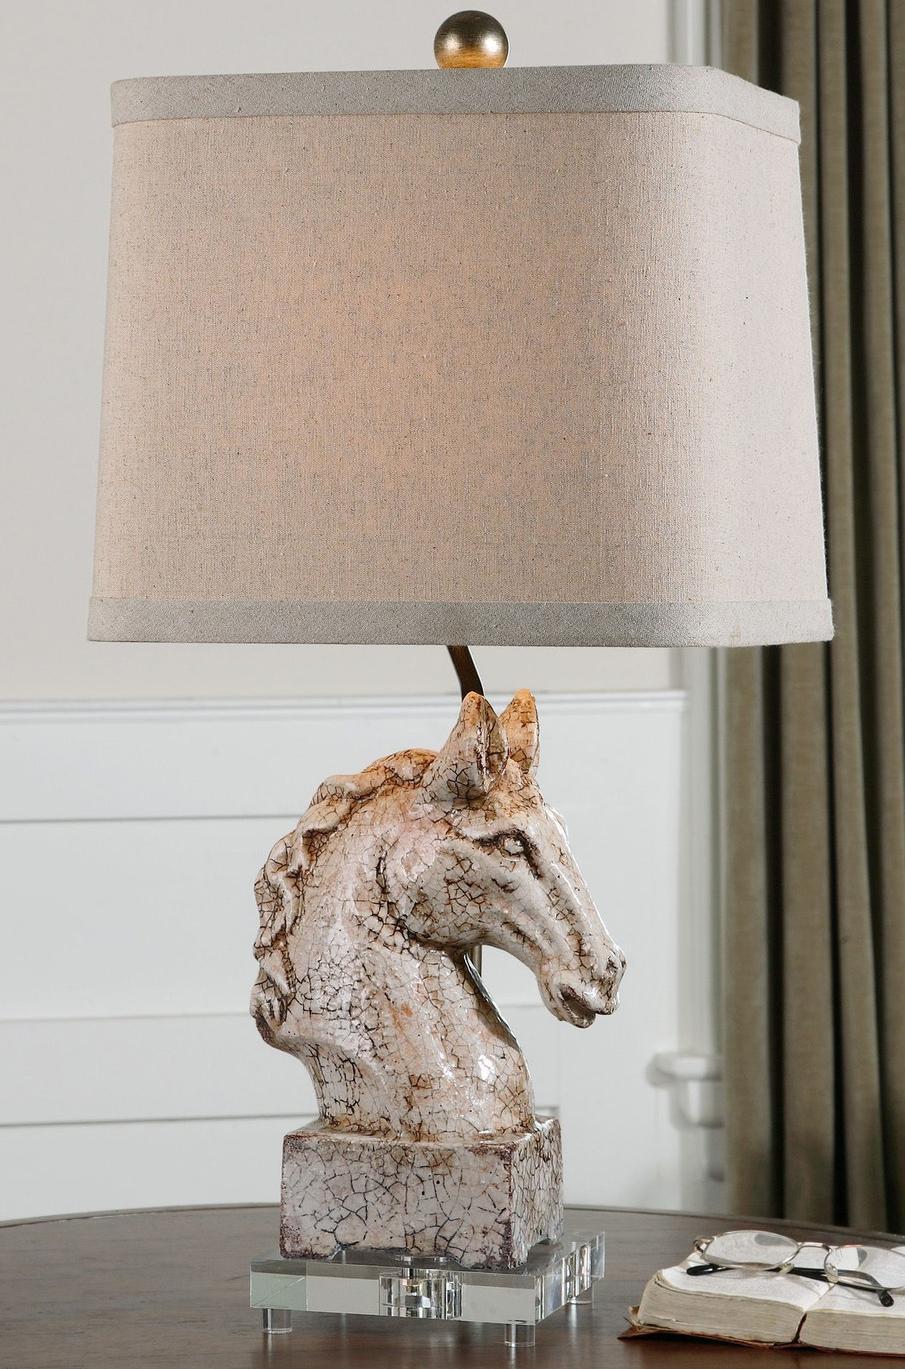 Rathin+Table+Lamp.jpg